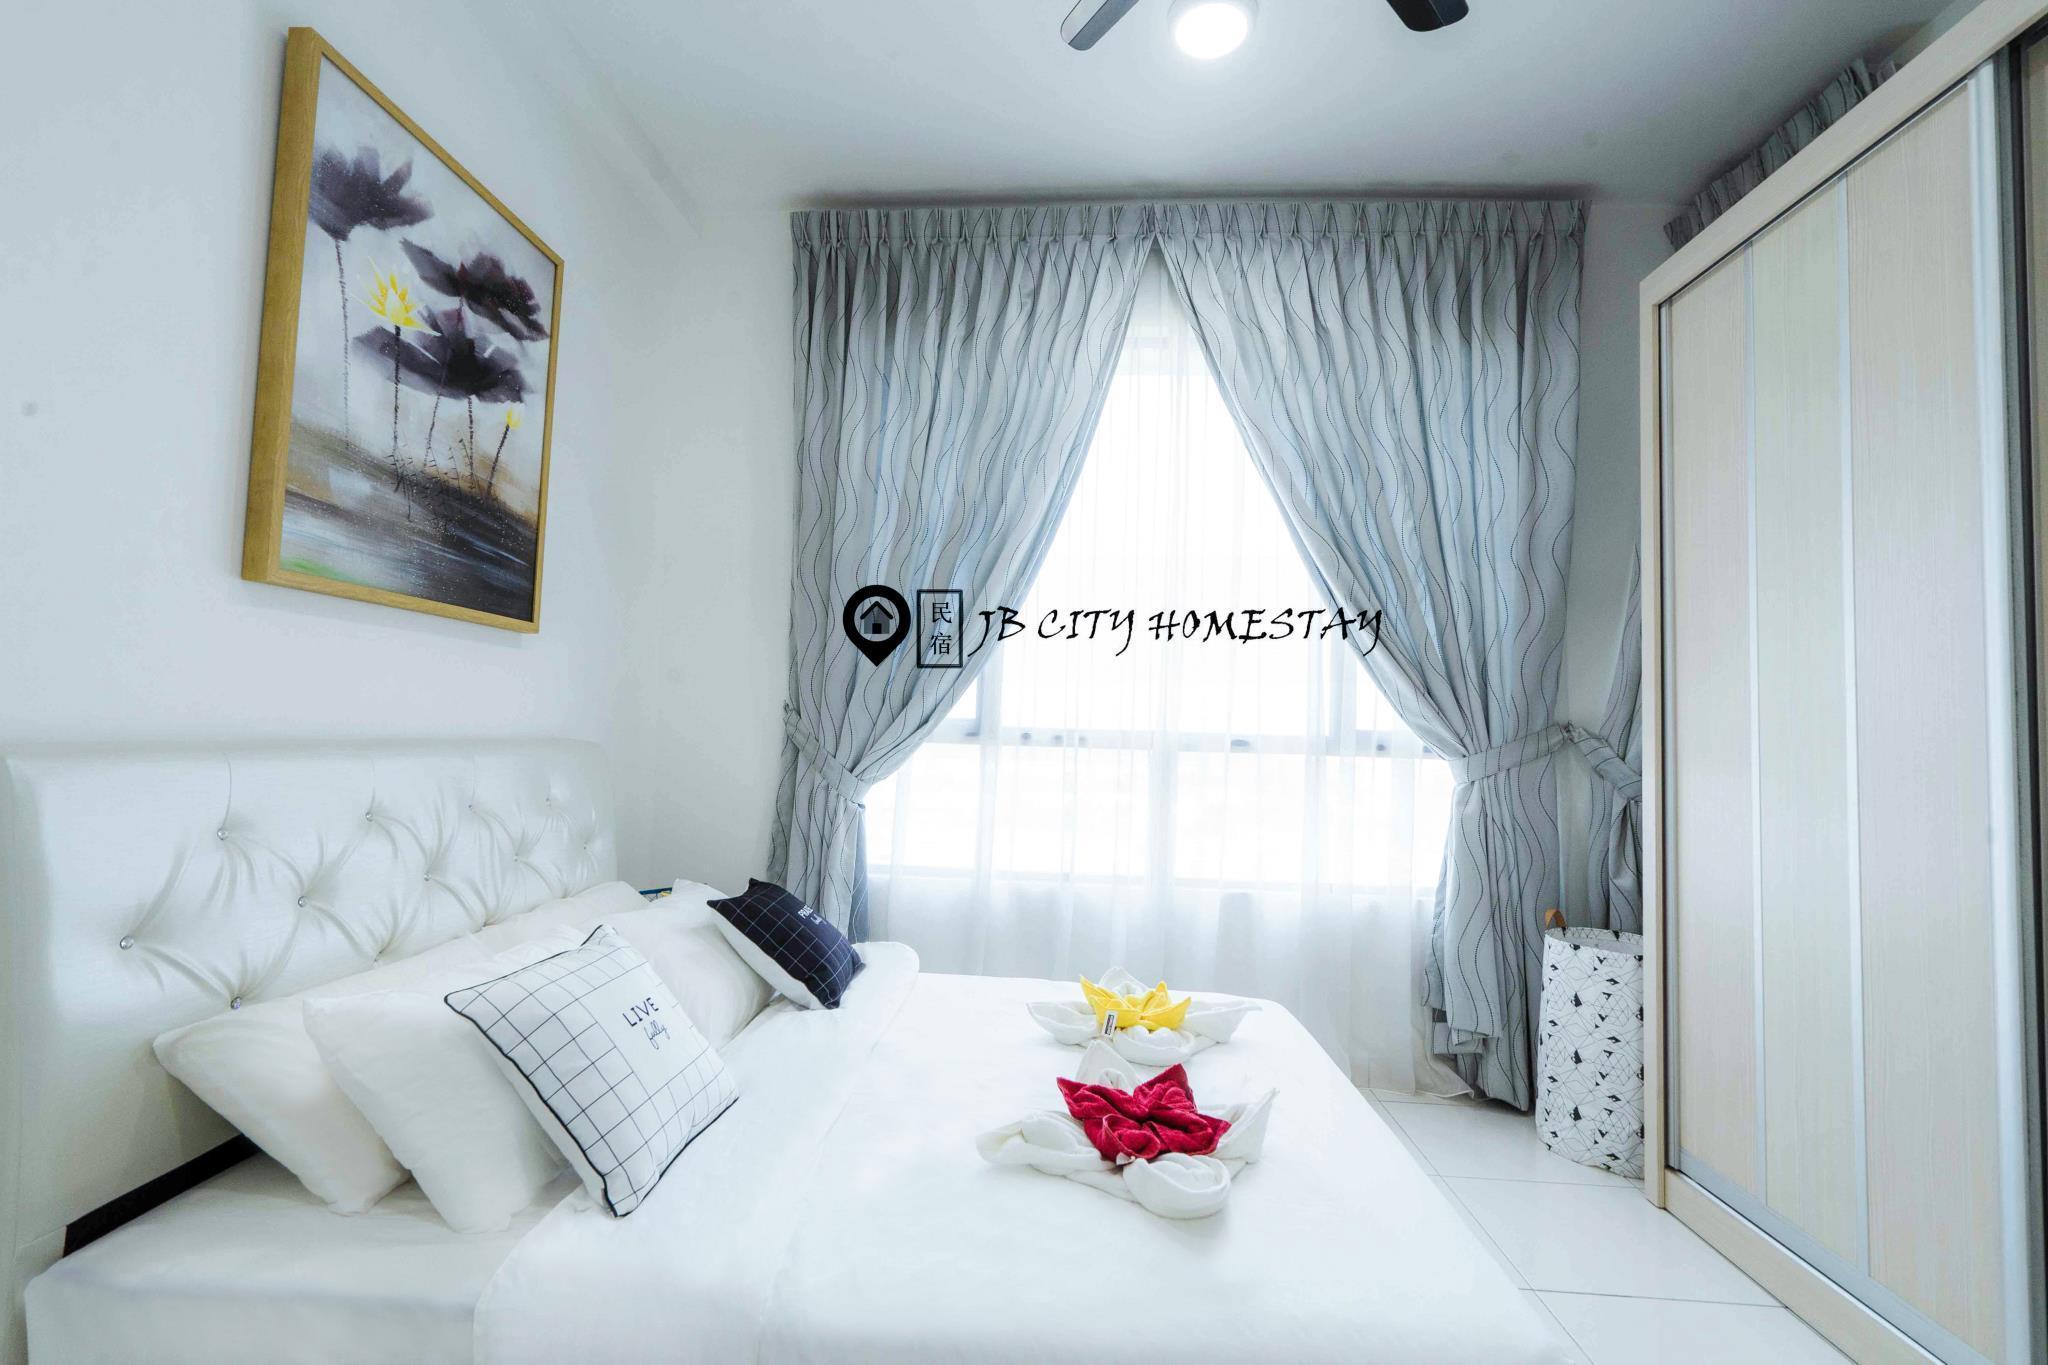 Sky Peak 3 Bedroom  1008 @ JB City Home